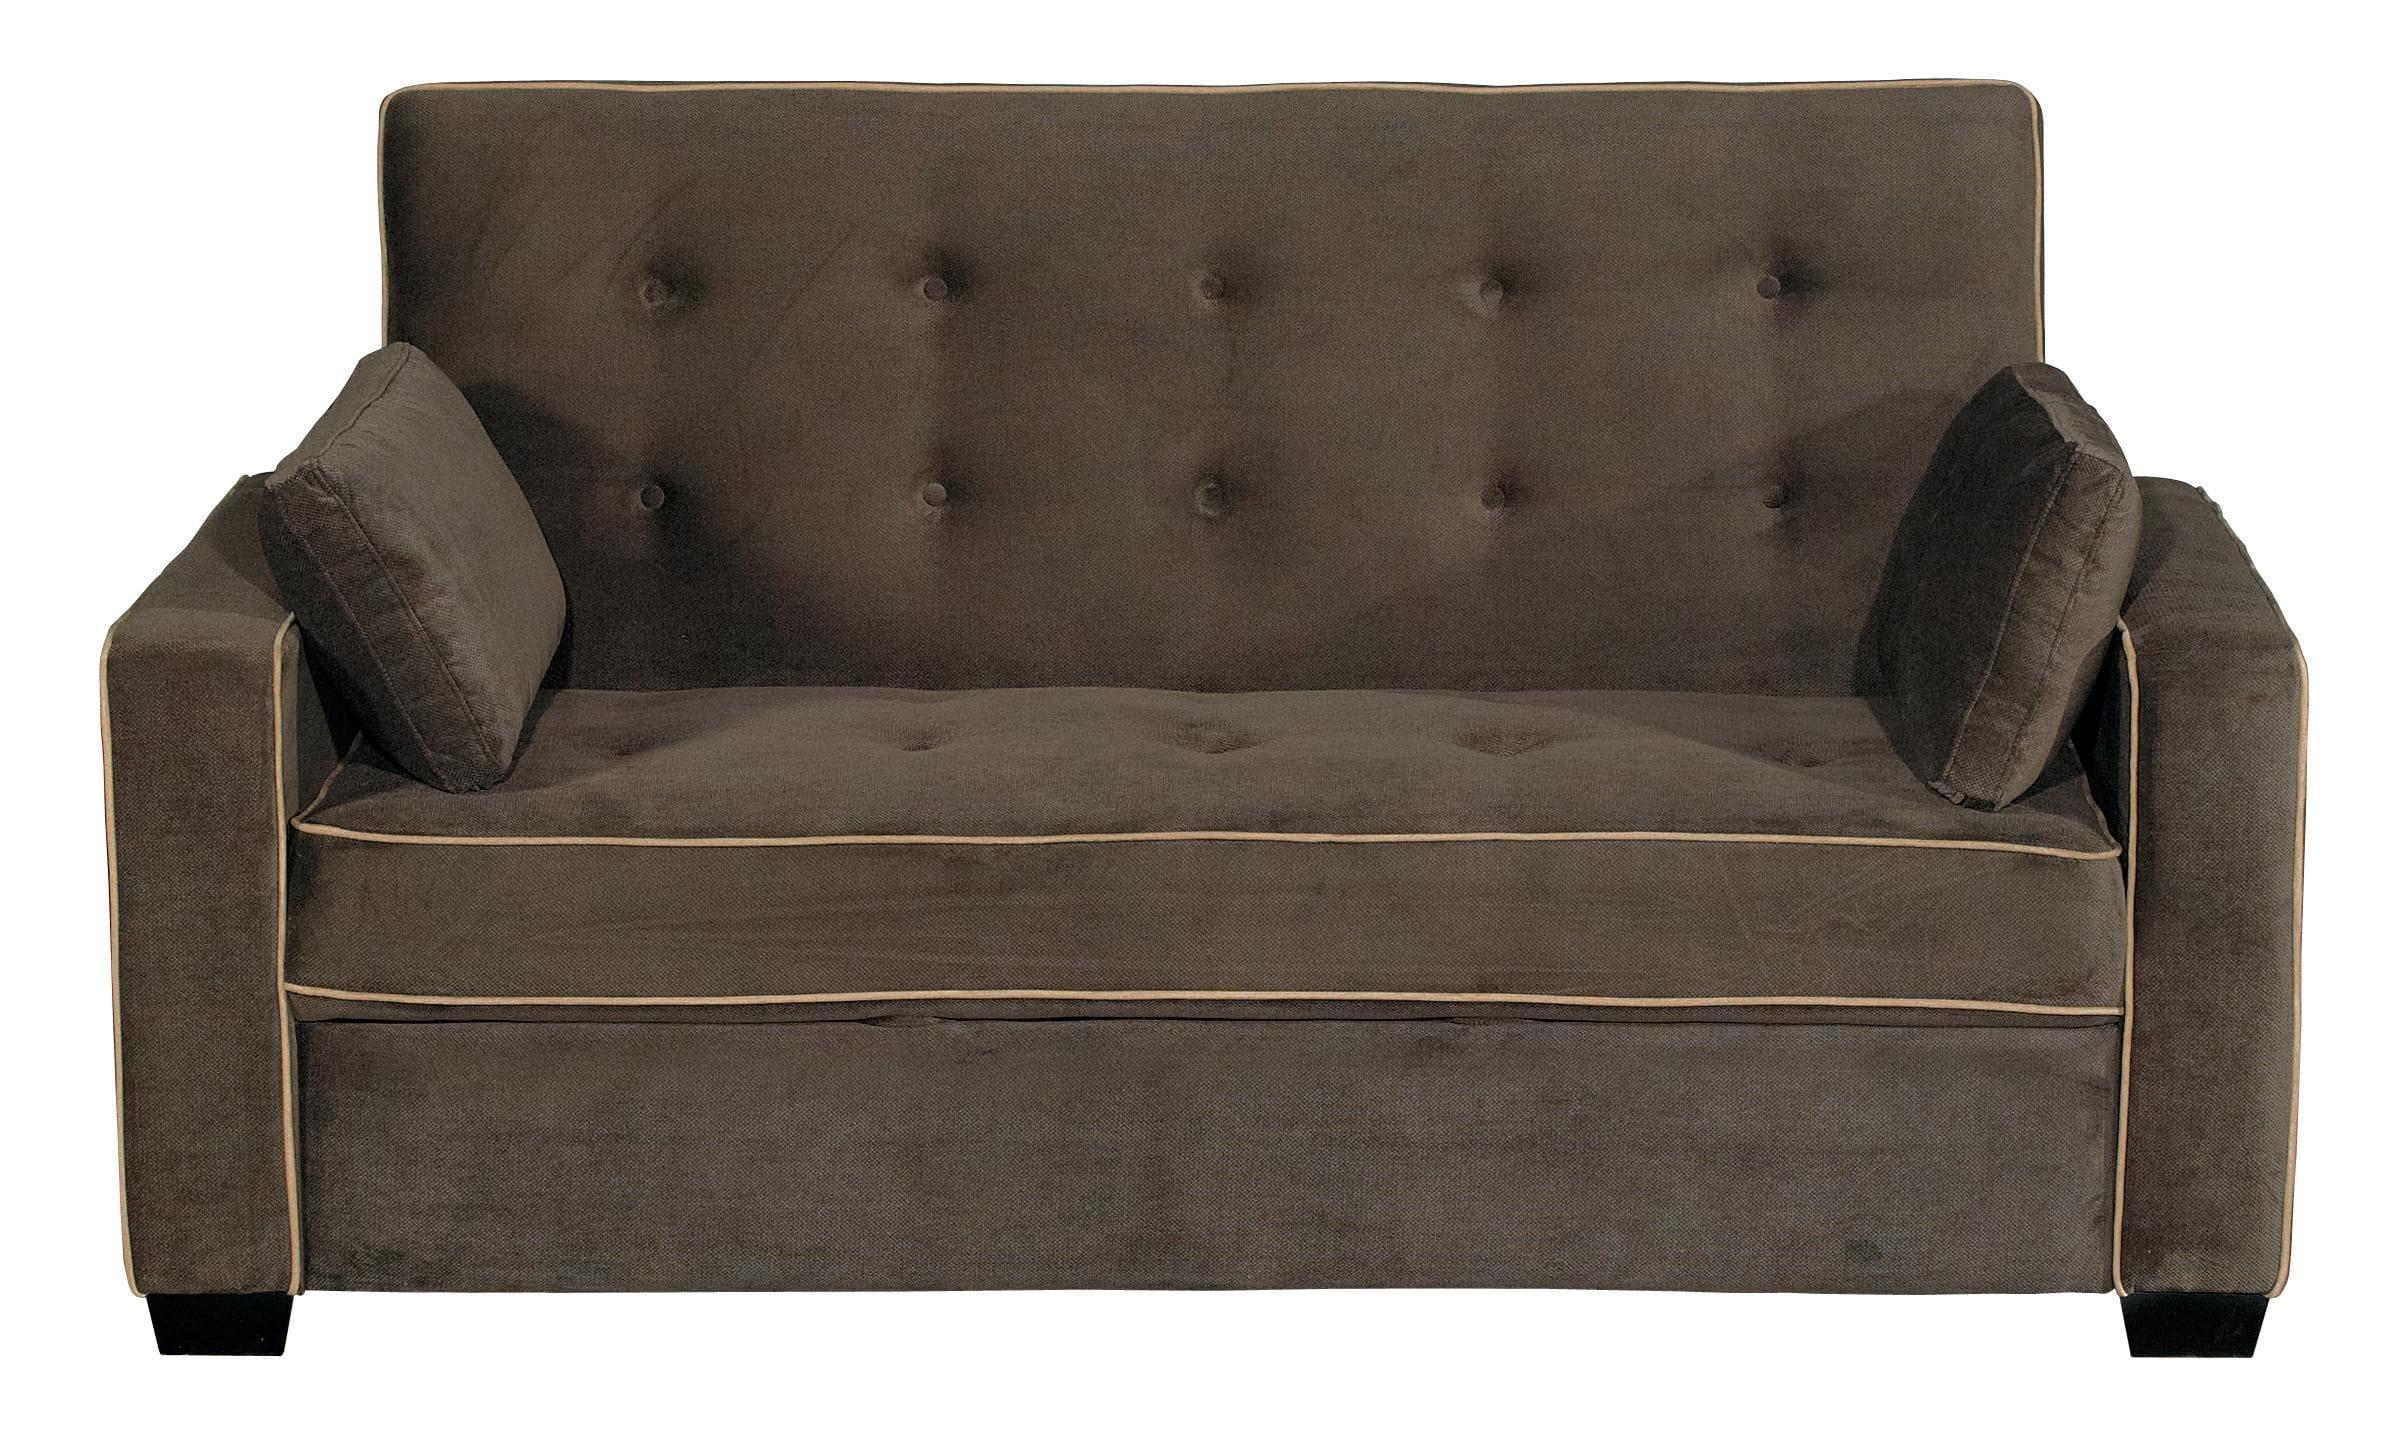 Sofa Bed Loveseat Size Porter Designs Cindy Memory Foam